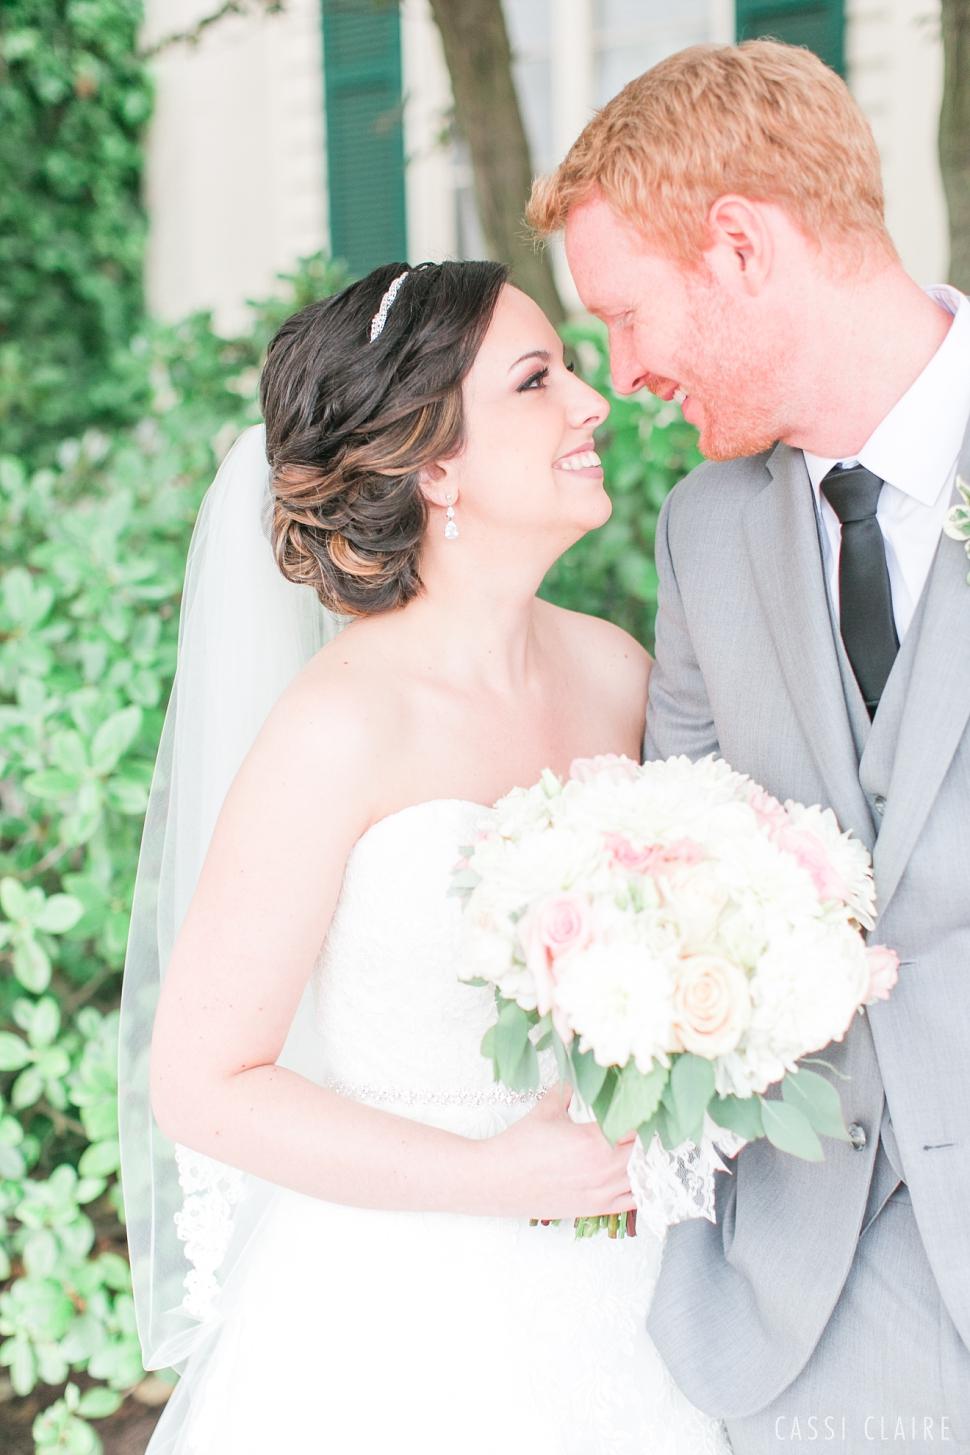 Davids-Country-Inn-Wedding-Photo_15.jpg